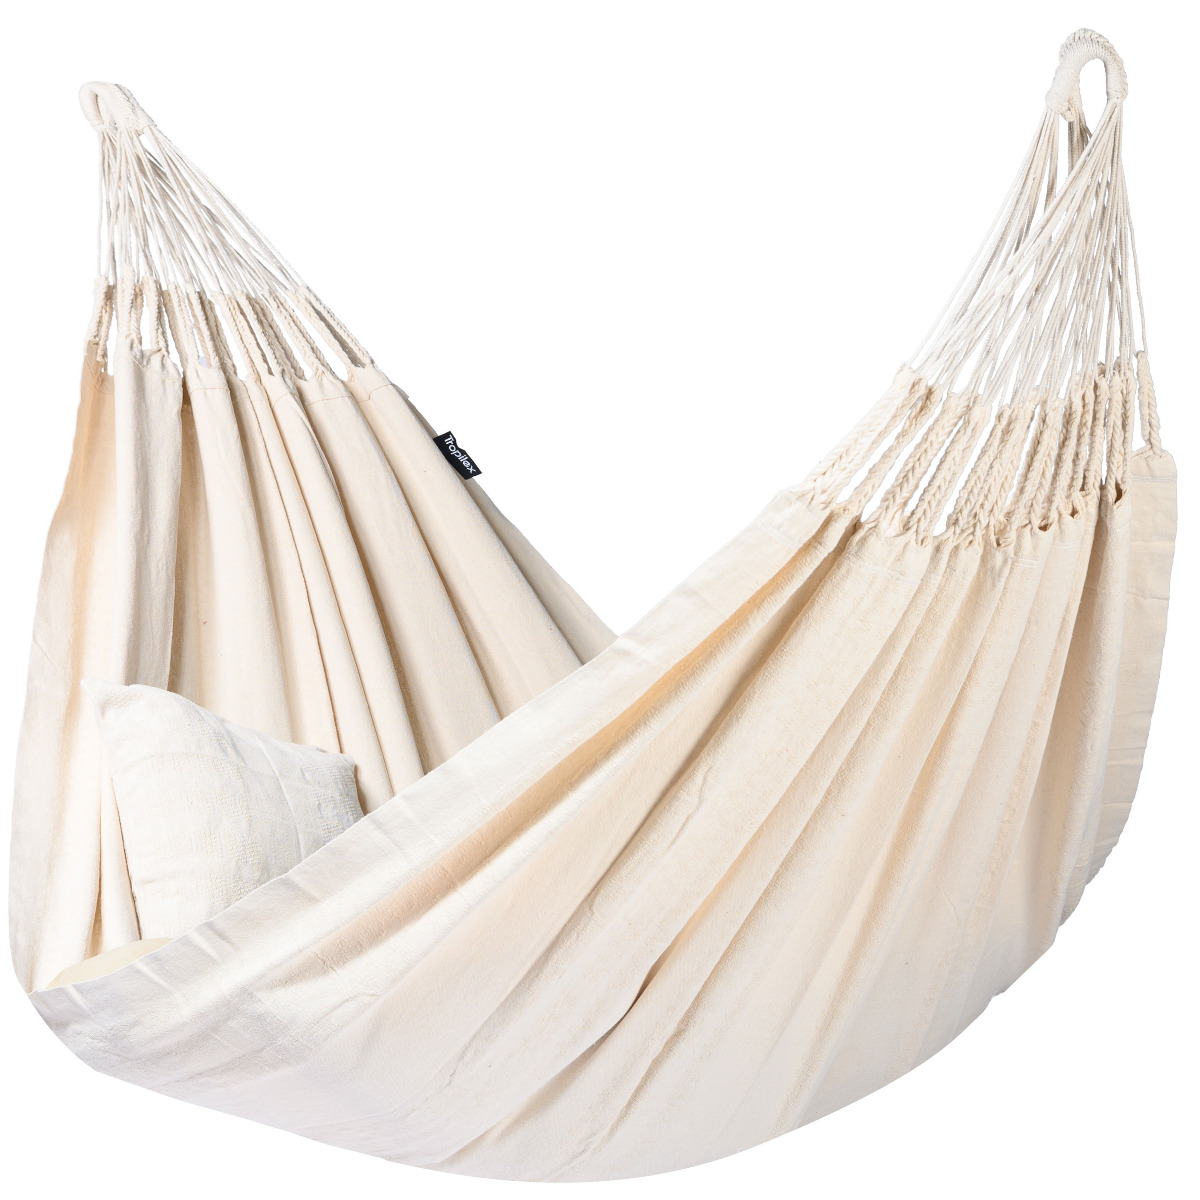 'Luxe' White XXL Hangmat - Wit - Ecru - Tropilex �